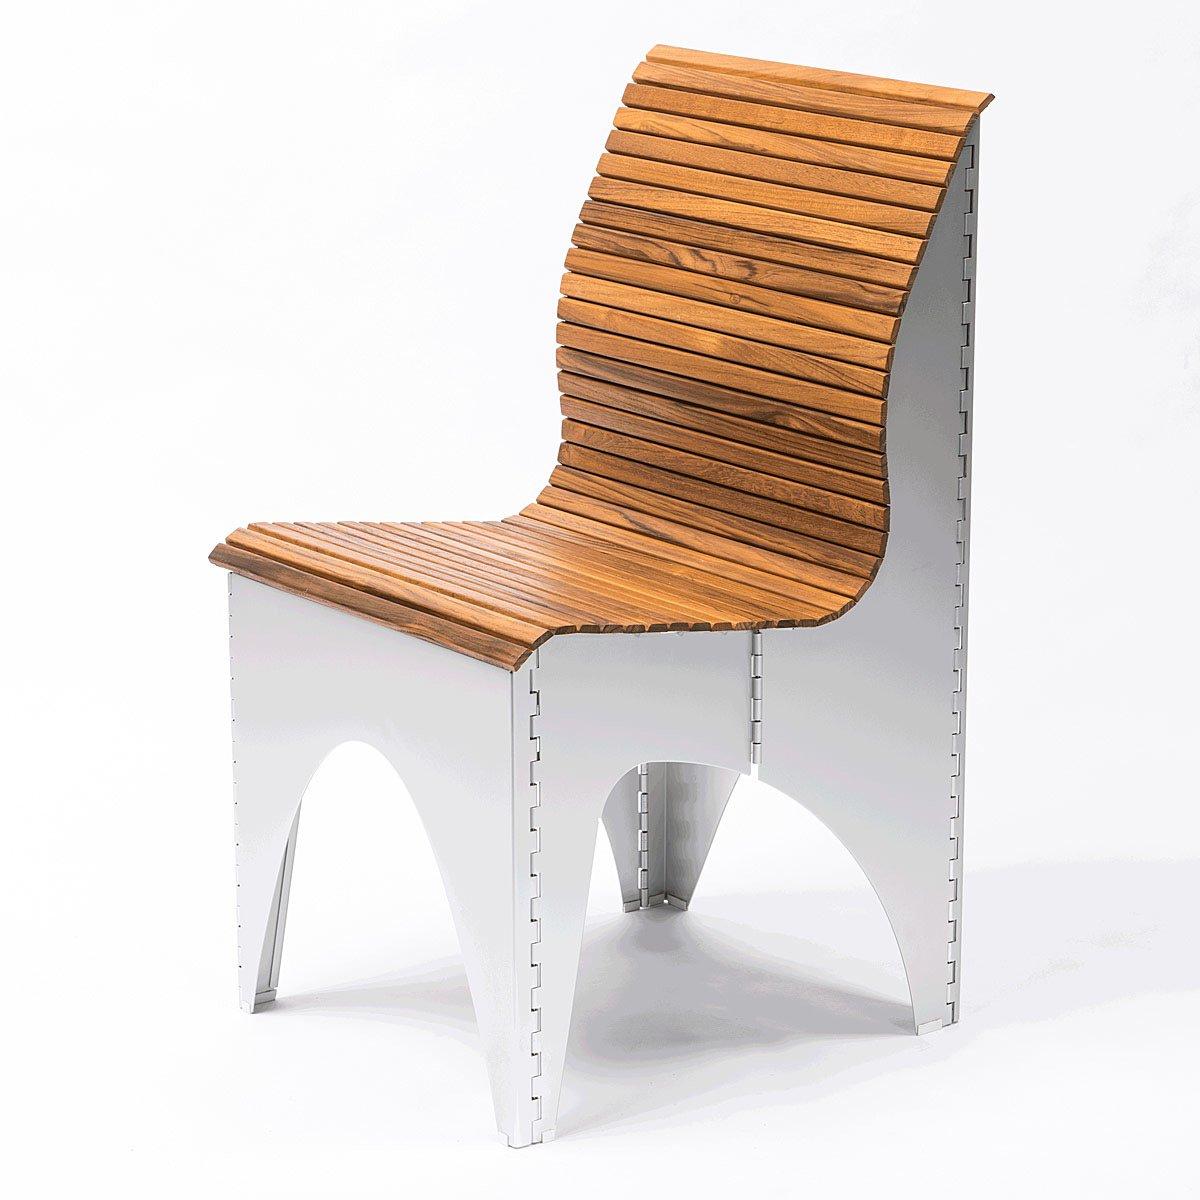 Ollie Shape Shifting Space Saving Folding Chair The Green Head